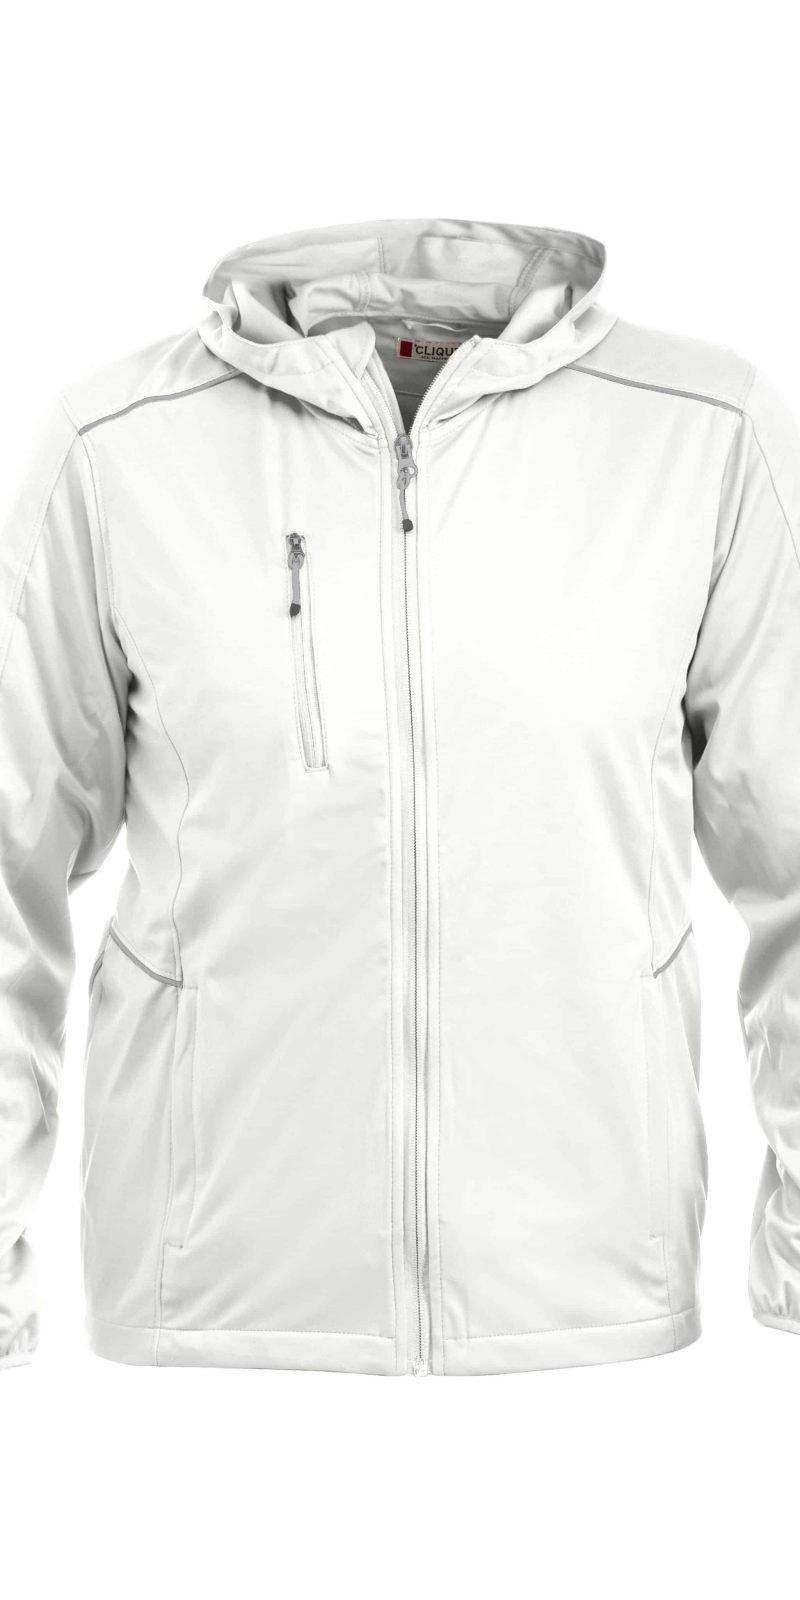 RSrnYC Men's Monroe Jacket